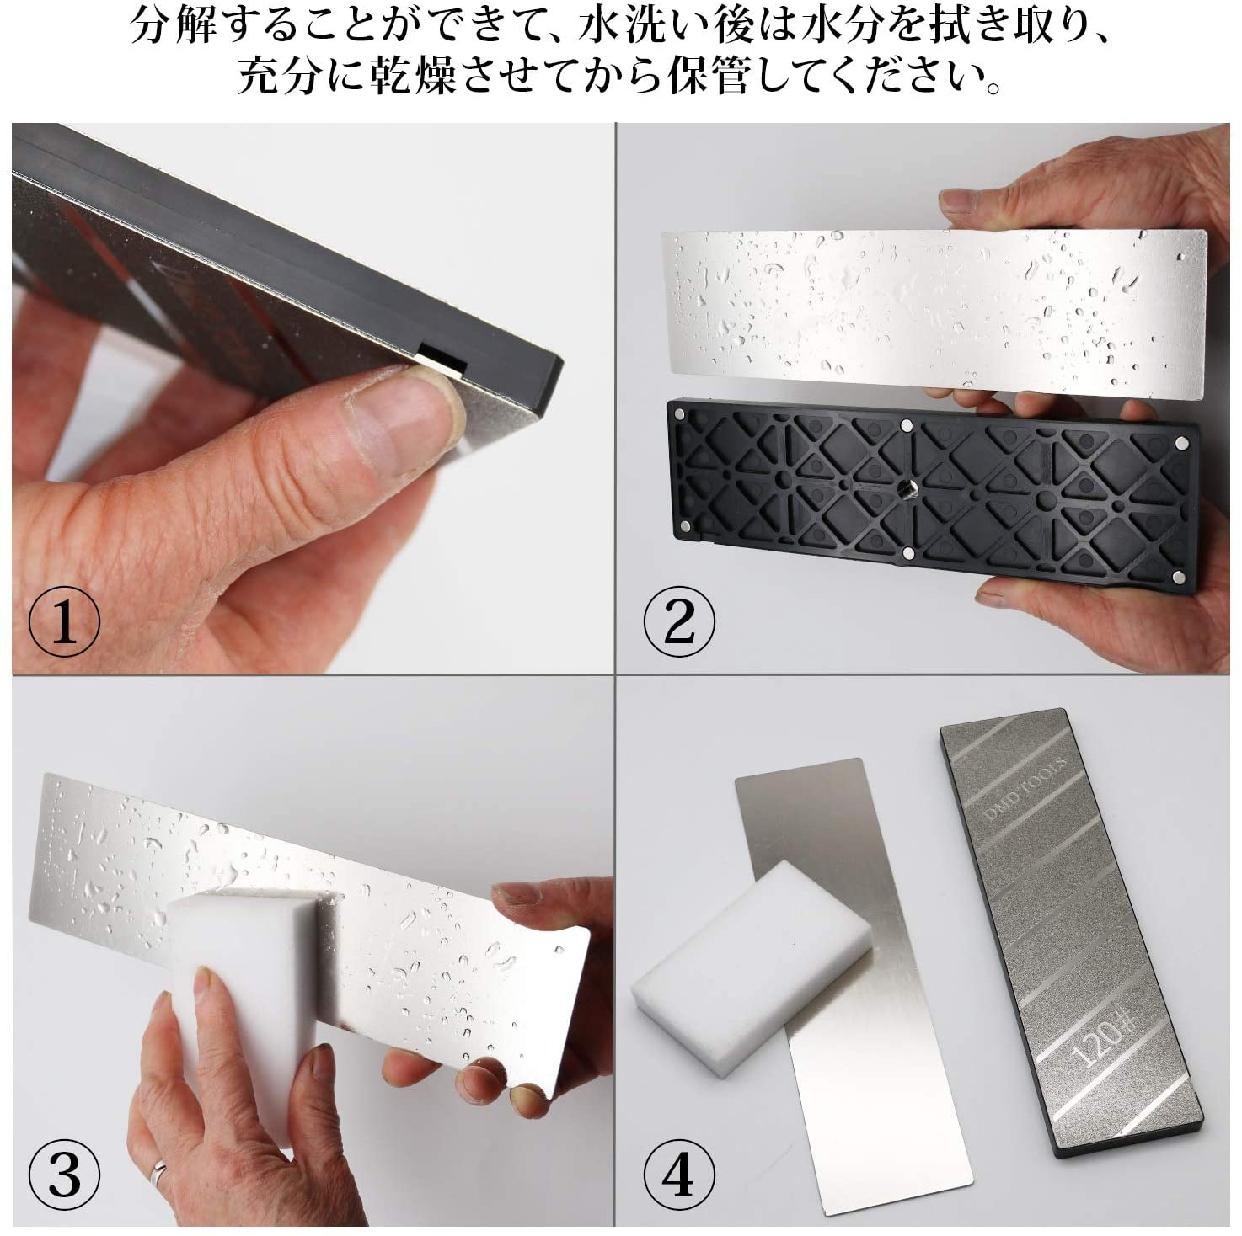 GOKEI 面直し用砥石 両面2役タイプ #180/#120 258×75×13mmの商品画像7